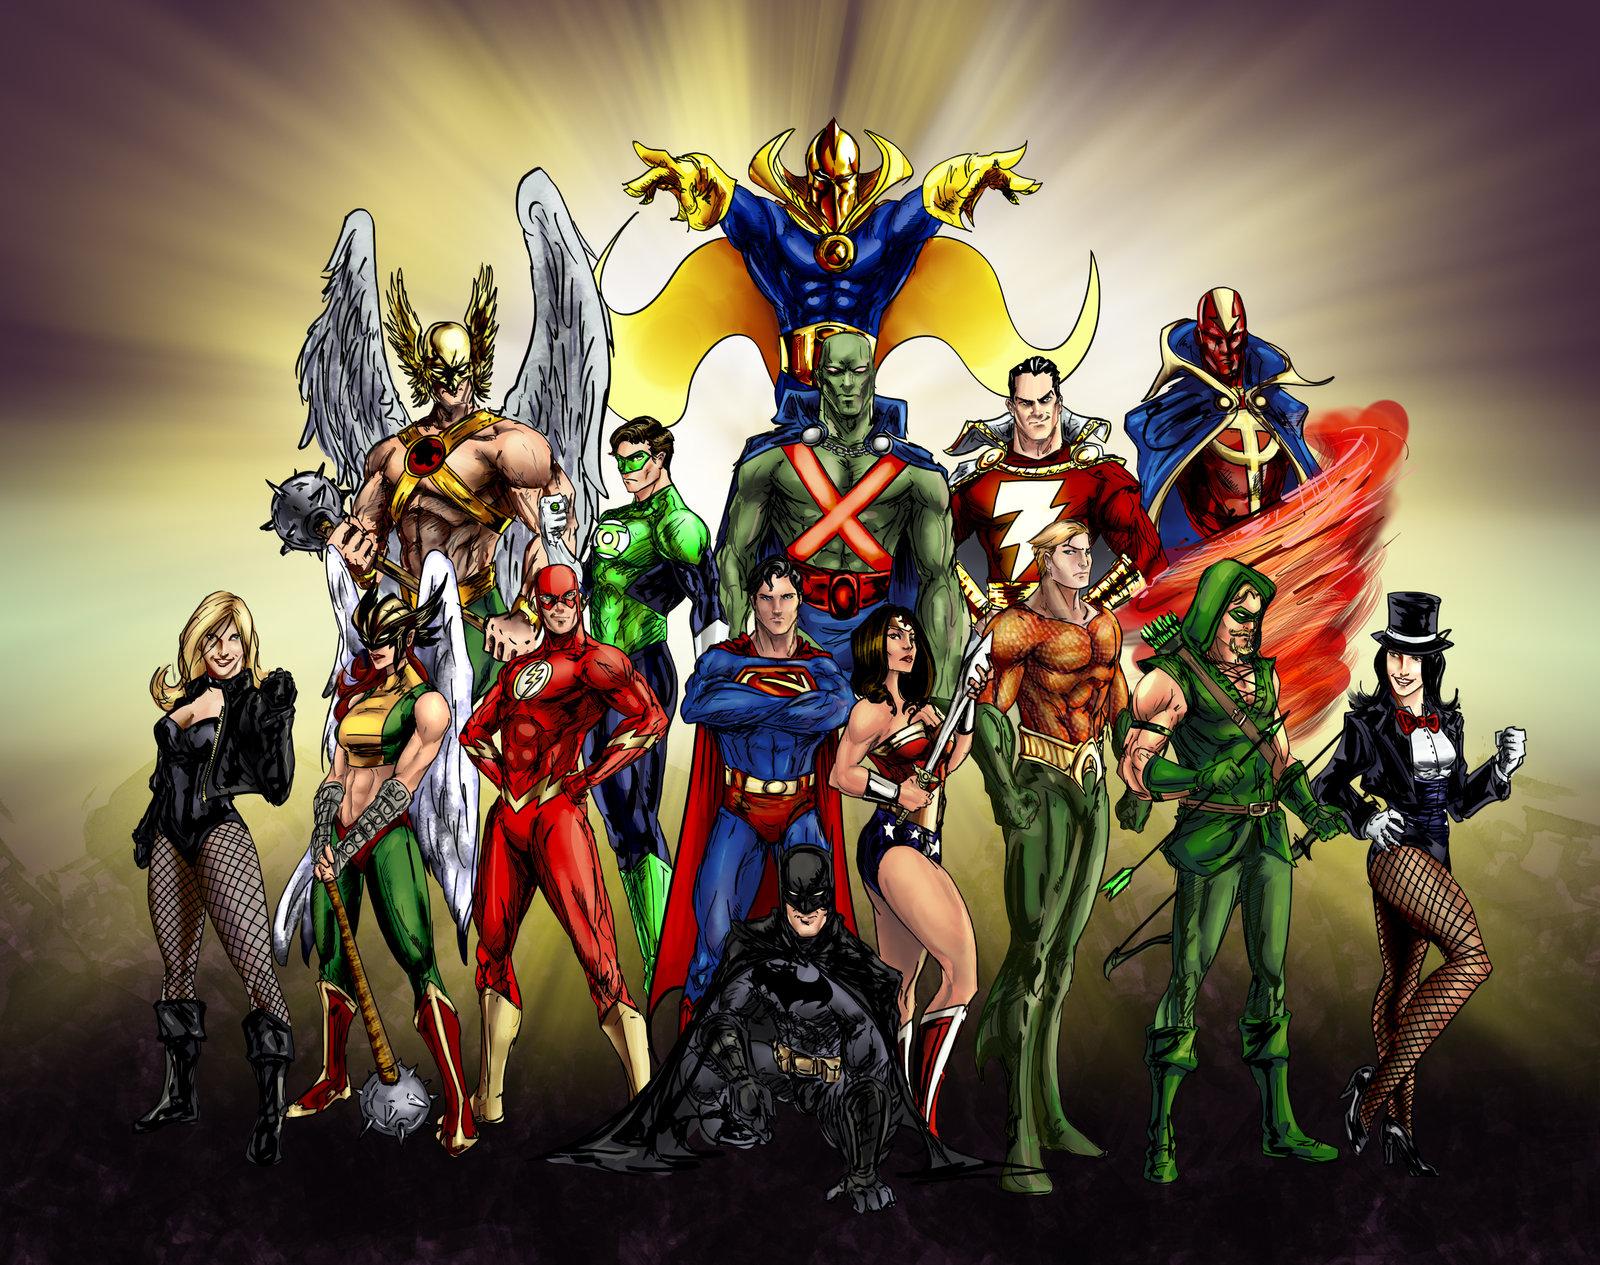 42 justice league hd wallpapers on wallpapersafari - Dc characters wallpaper hd ...